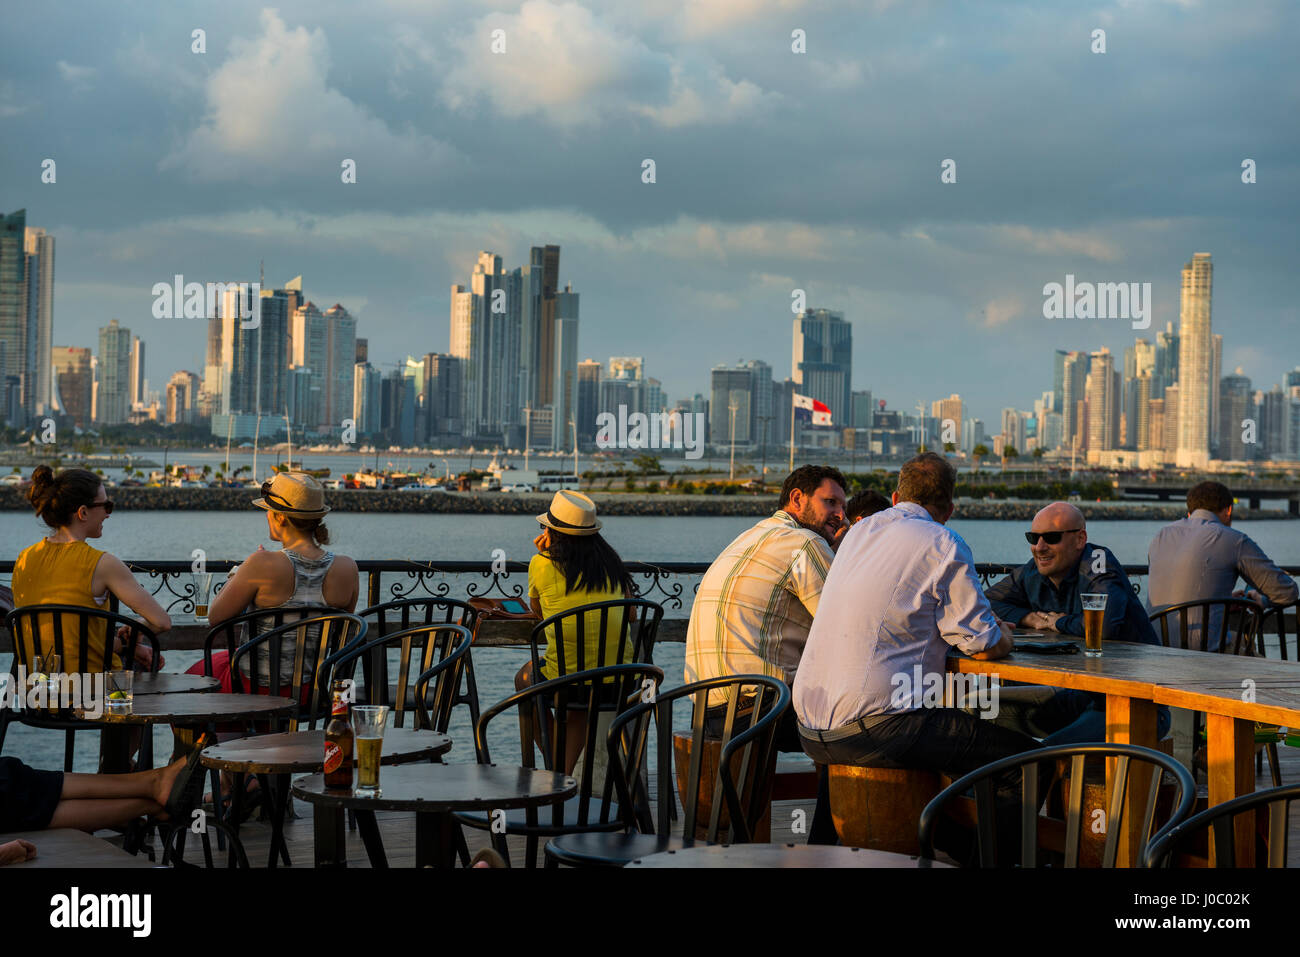 Bar in Casco Viejo overlooking the skyline of Panama City, Panama, Central America - Stock Image